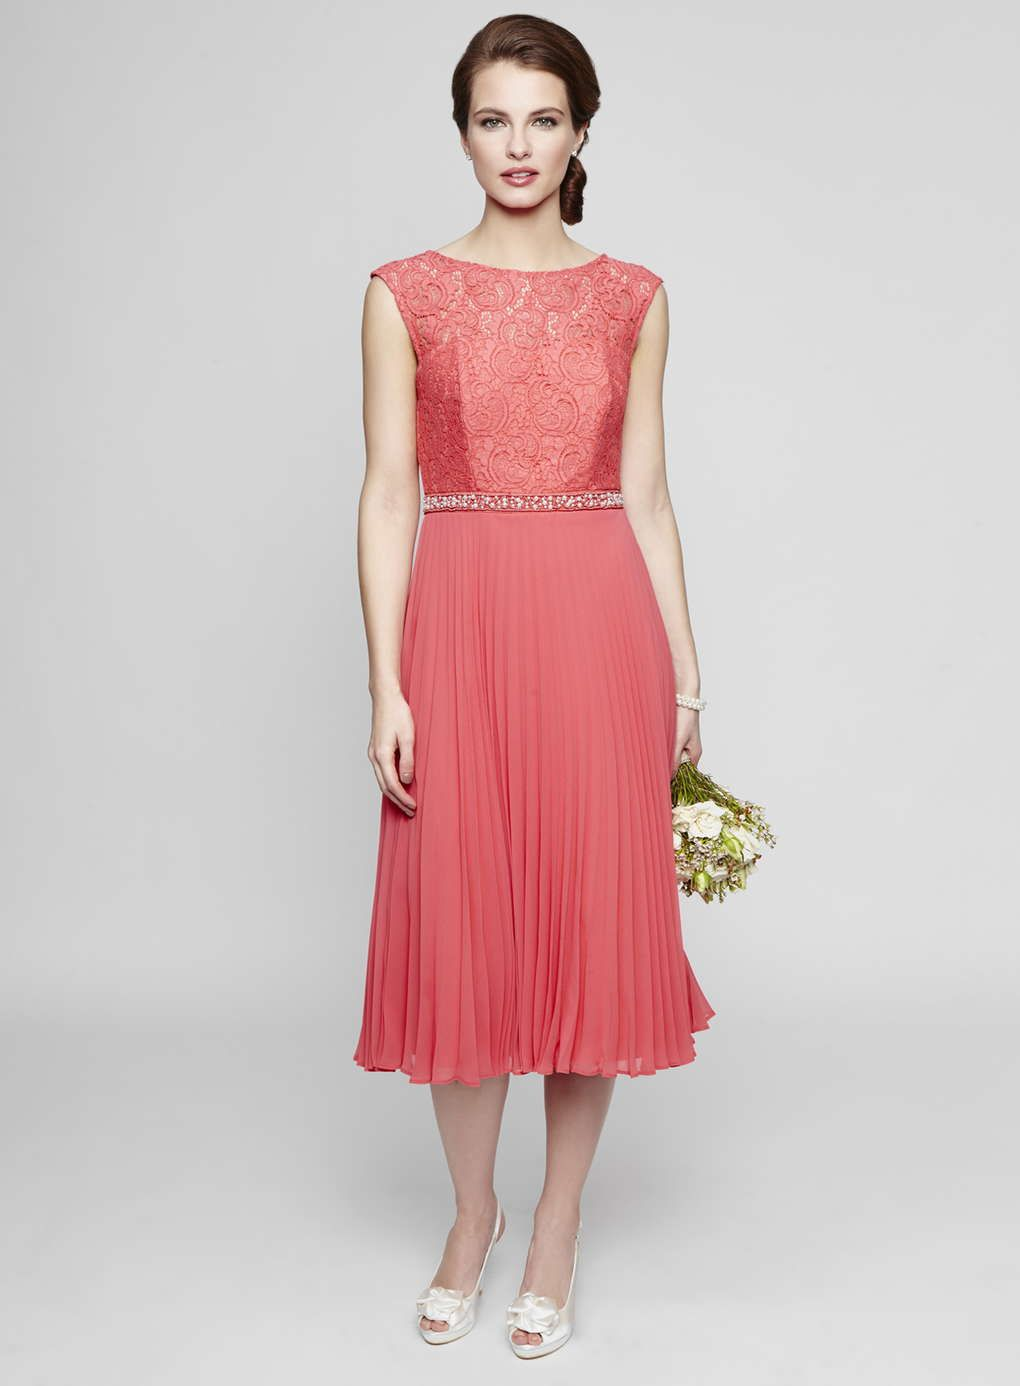 Deep coral louisa lace pleat bridesmaids dress httpwww deep coral louisa lace pleat bridesmaids dress httpweddingheart ombrellifo Choice Image